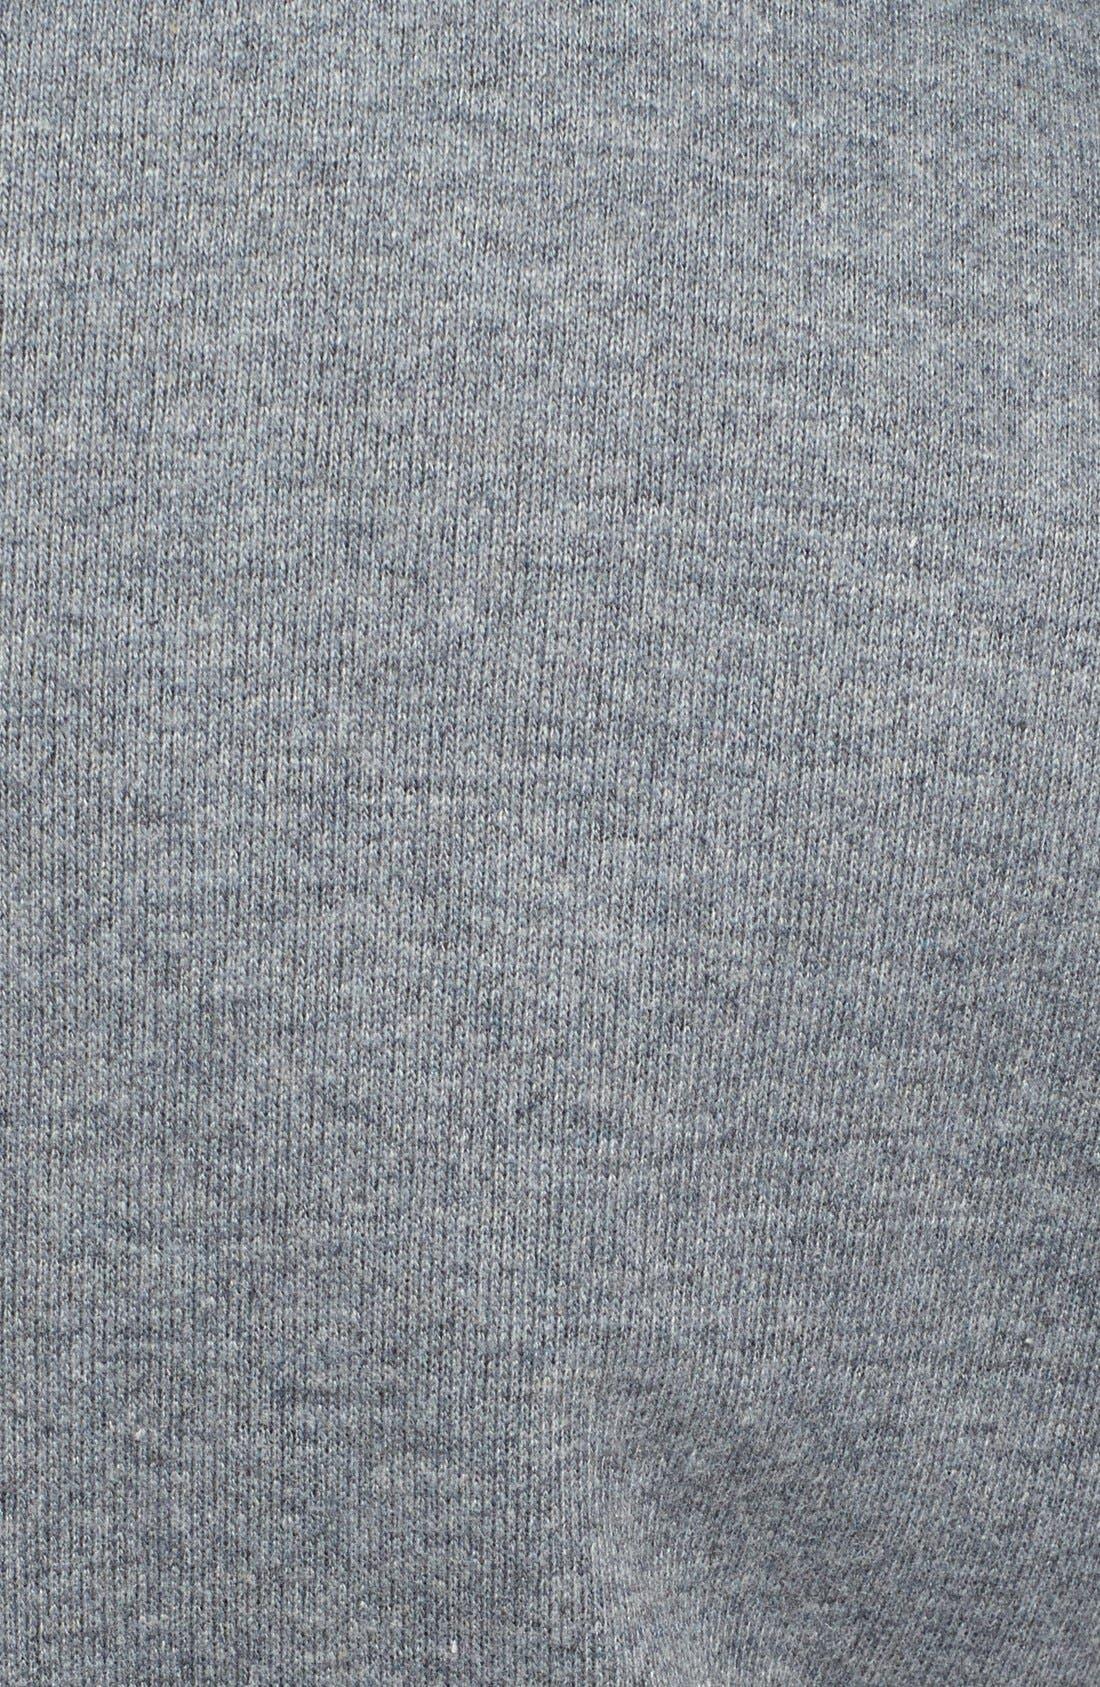 Alternate Image 3  - Antony Morato Wool Blend Jacket